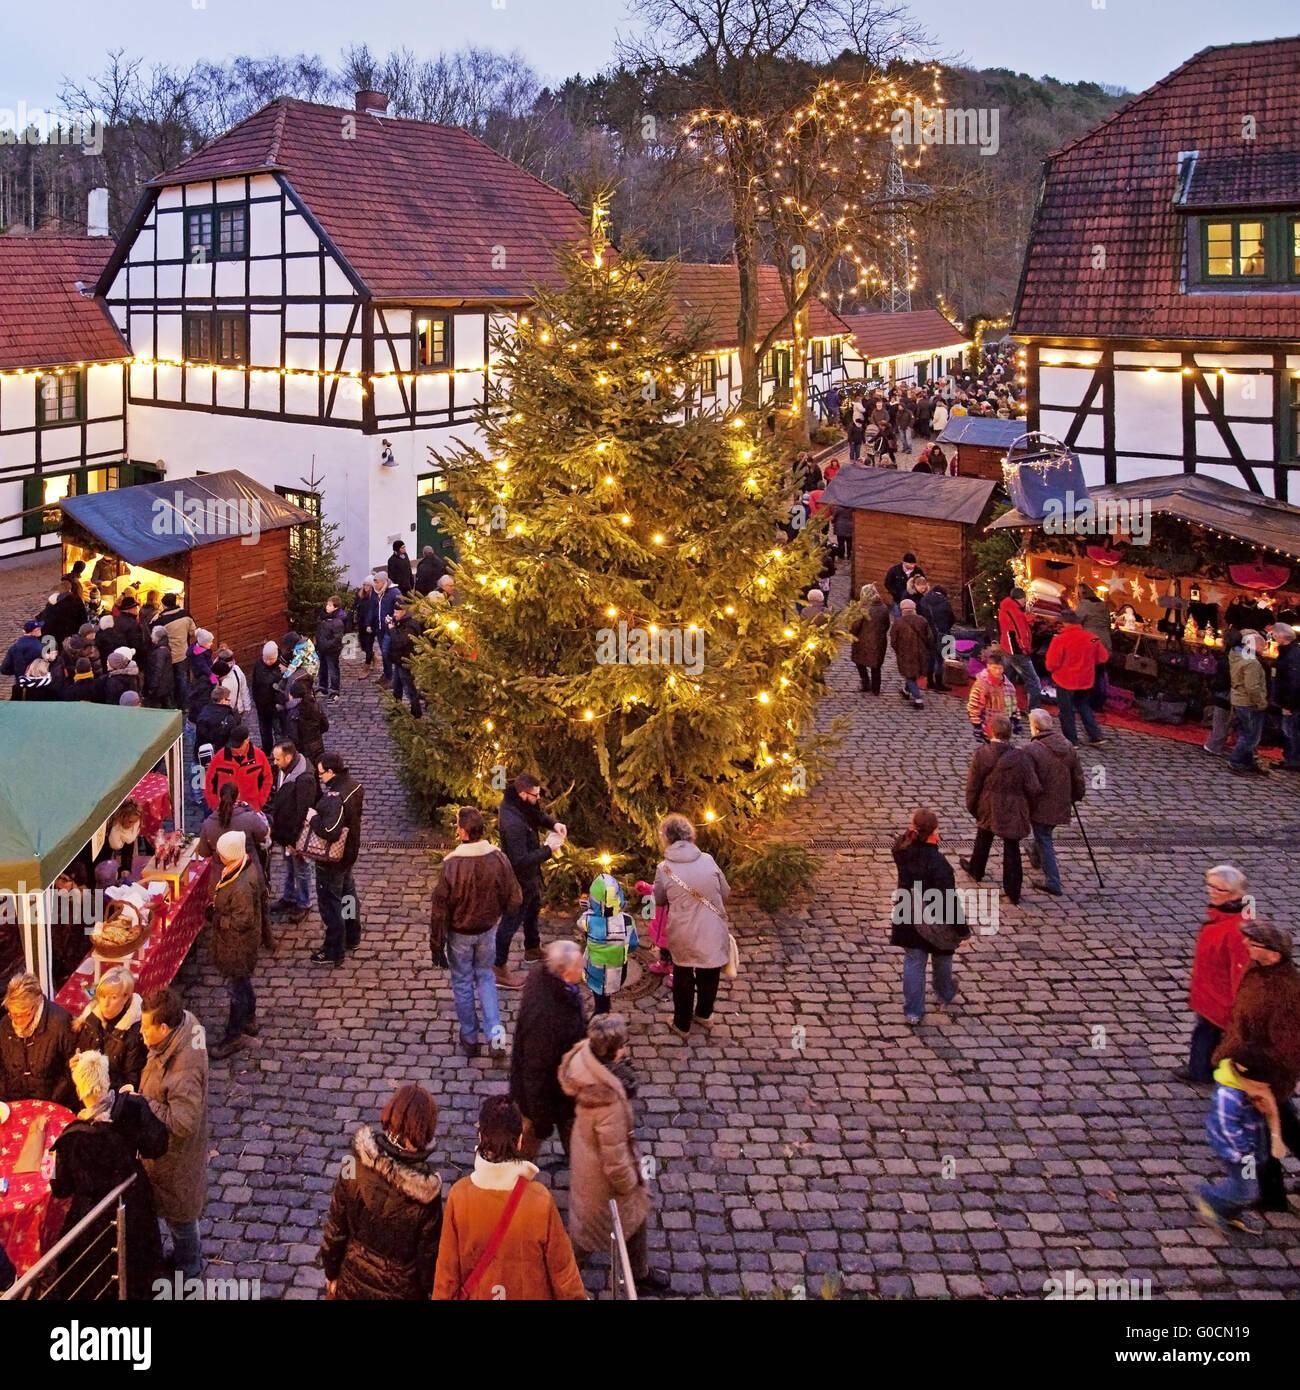 Weihnachtsmarkt am Maste-Barendorf, Iserlohn Stockbild